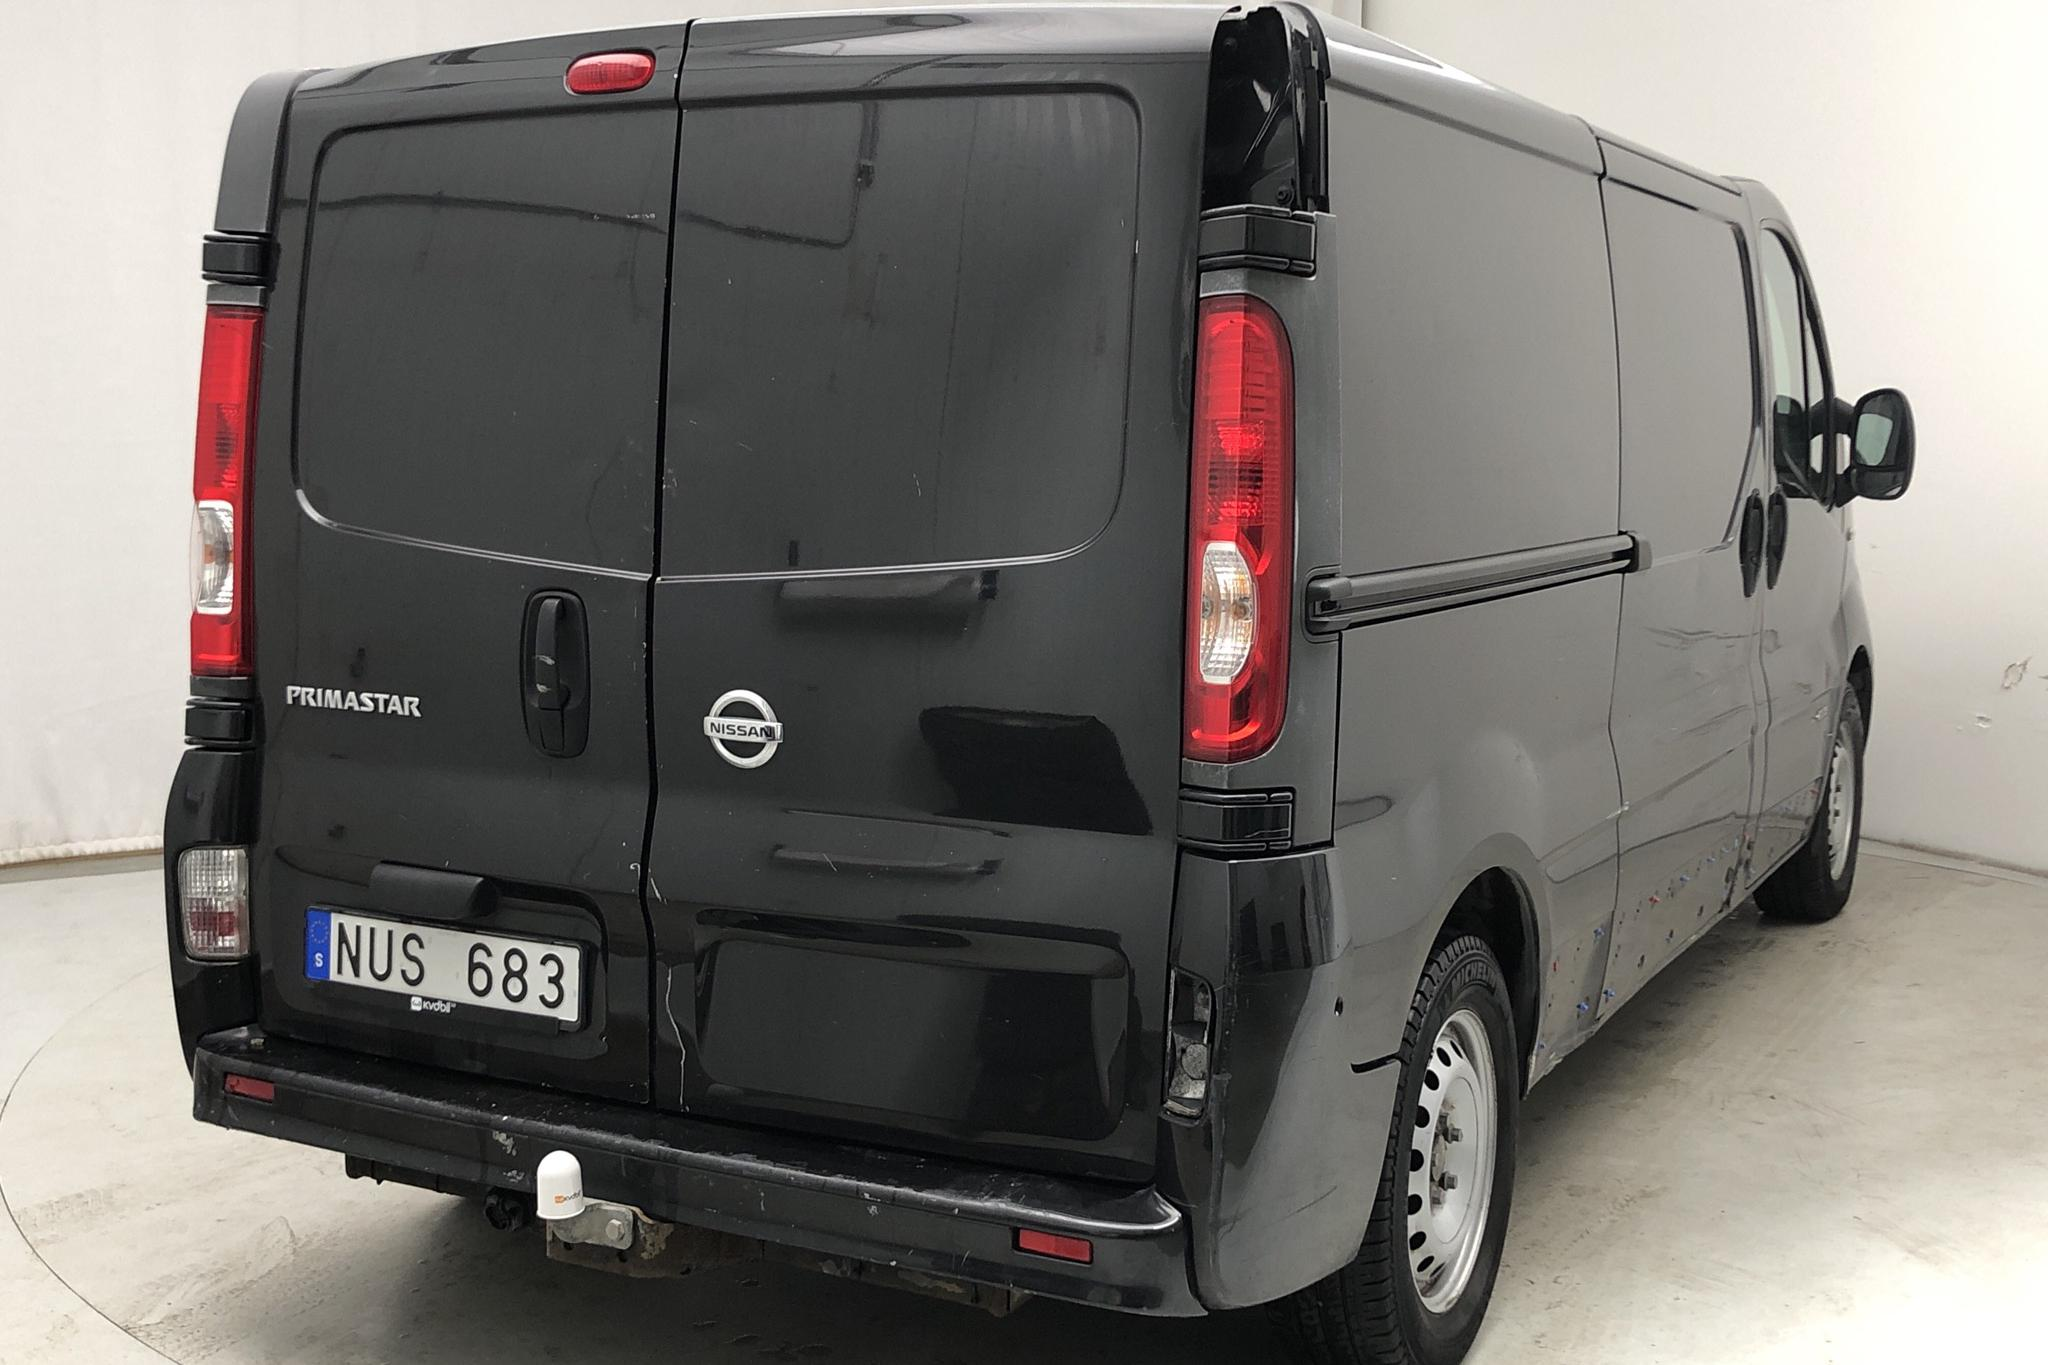 Nissan Primastar 2.0 dCi (114hk) - 16 031 mil - Manuell - svart - 2014